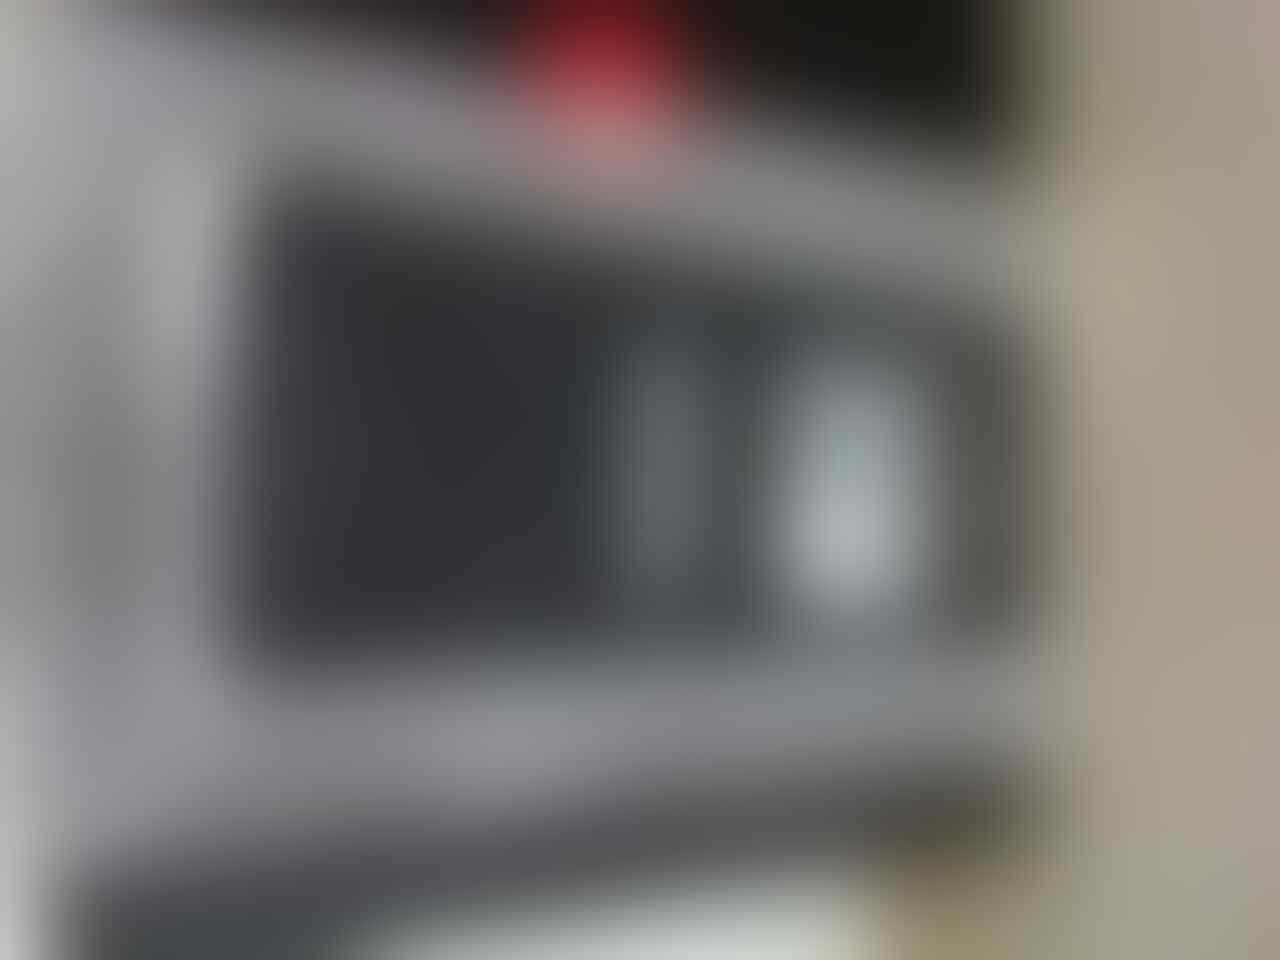 Android Motorola MOTO RAZR M XT907 VERIZON ExUs Gsm-Cdma ruim Mulus ajib Fullset